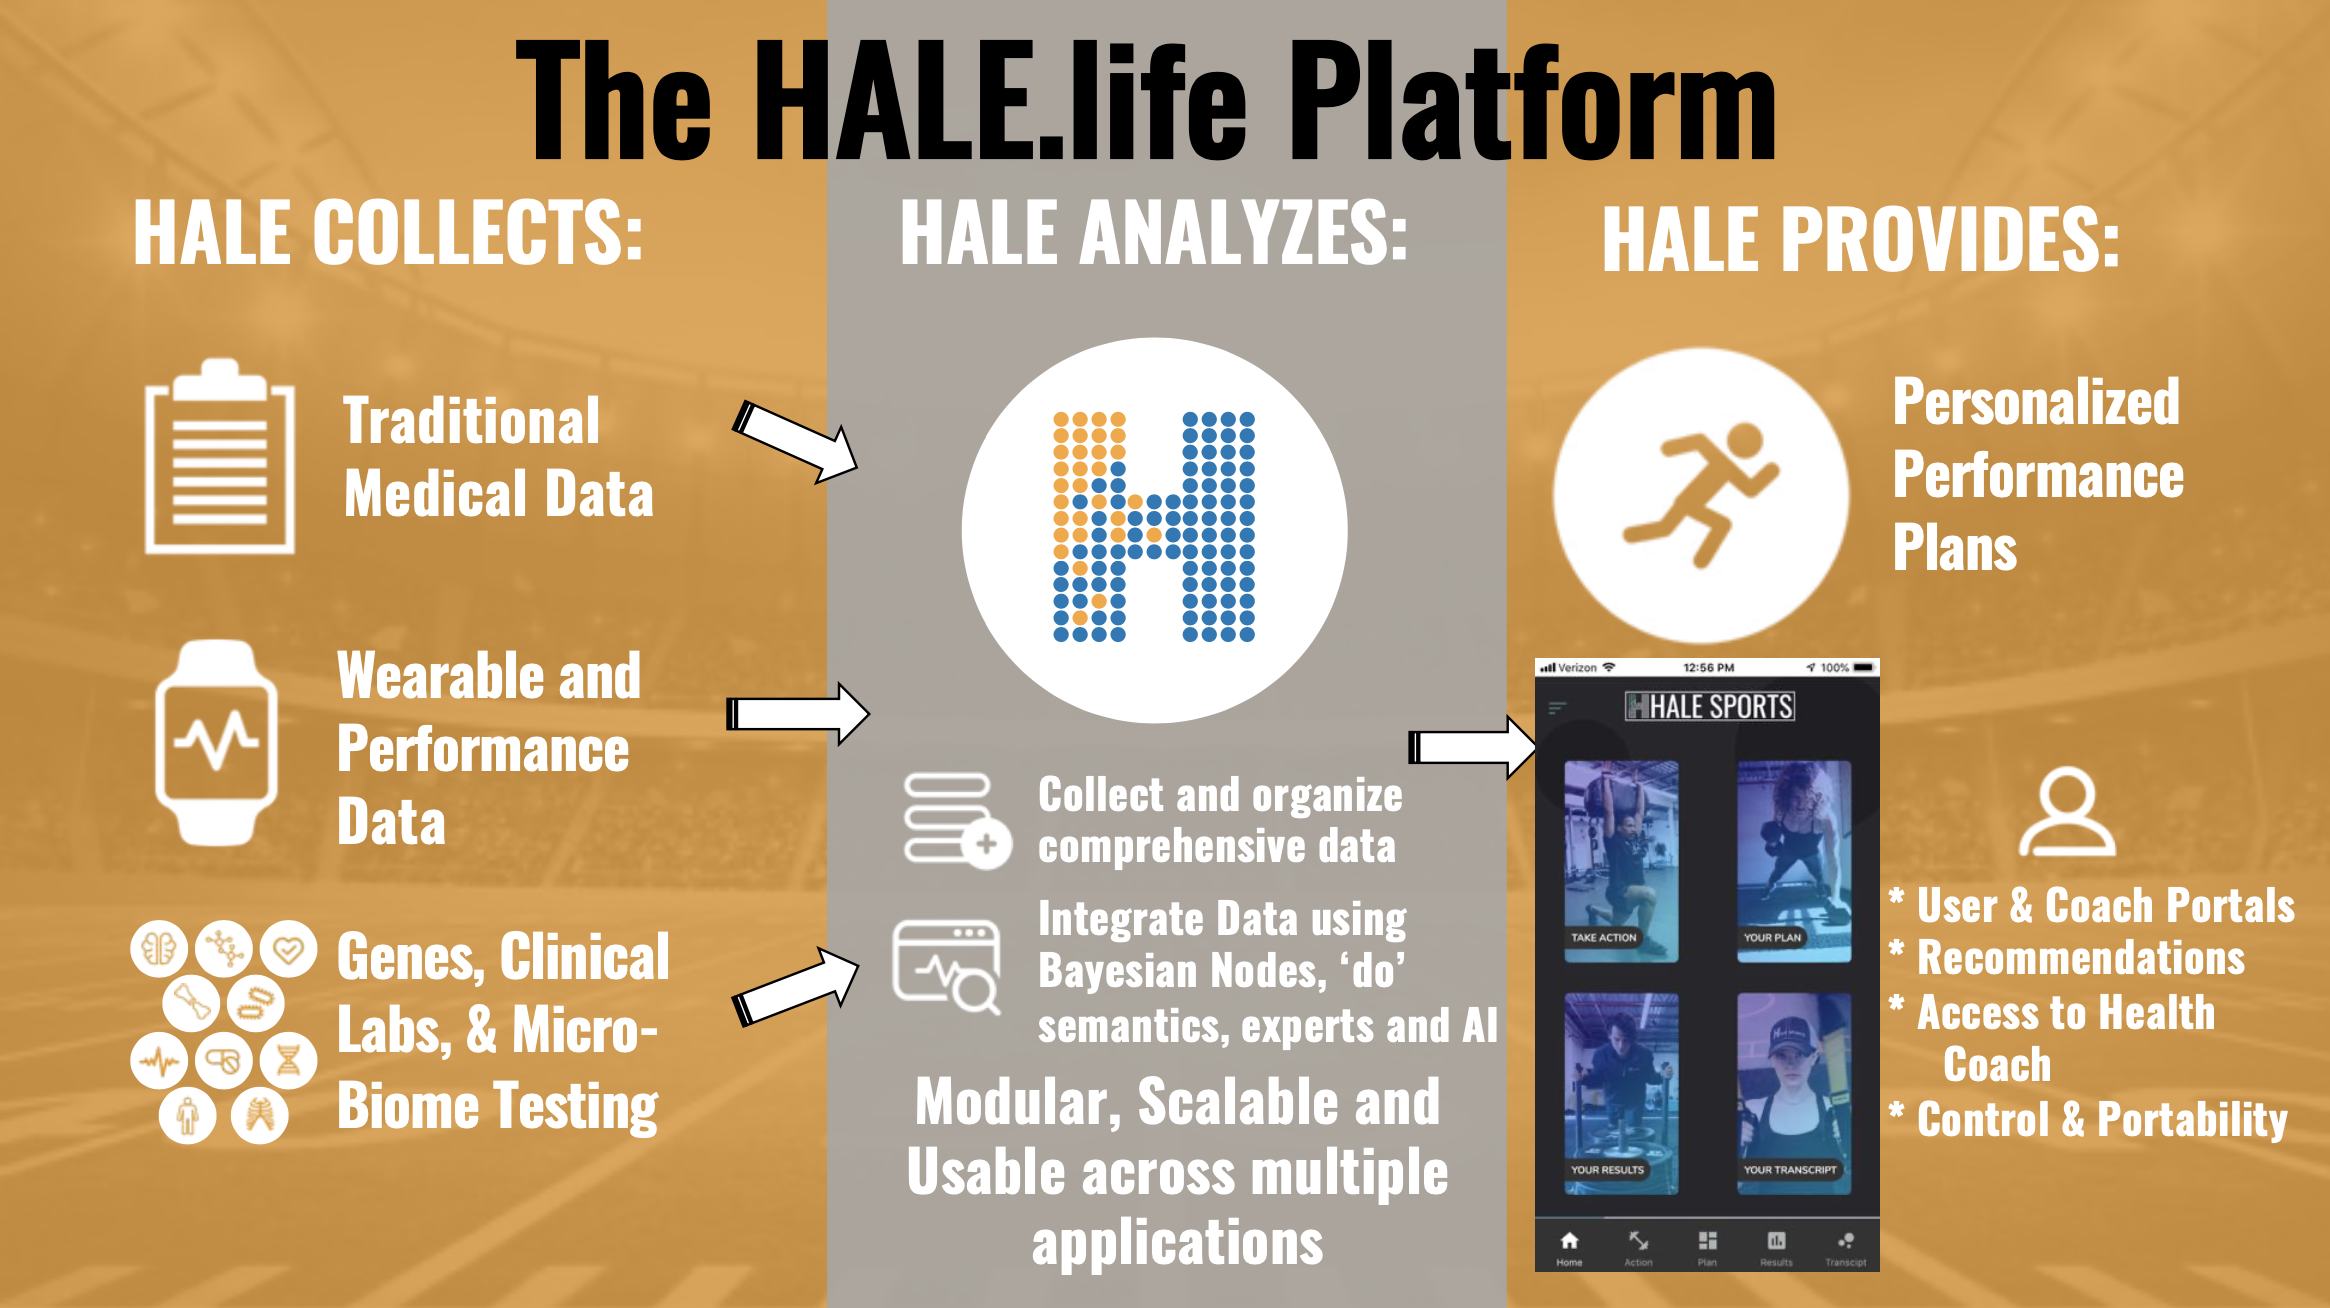 HALE.life Corp